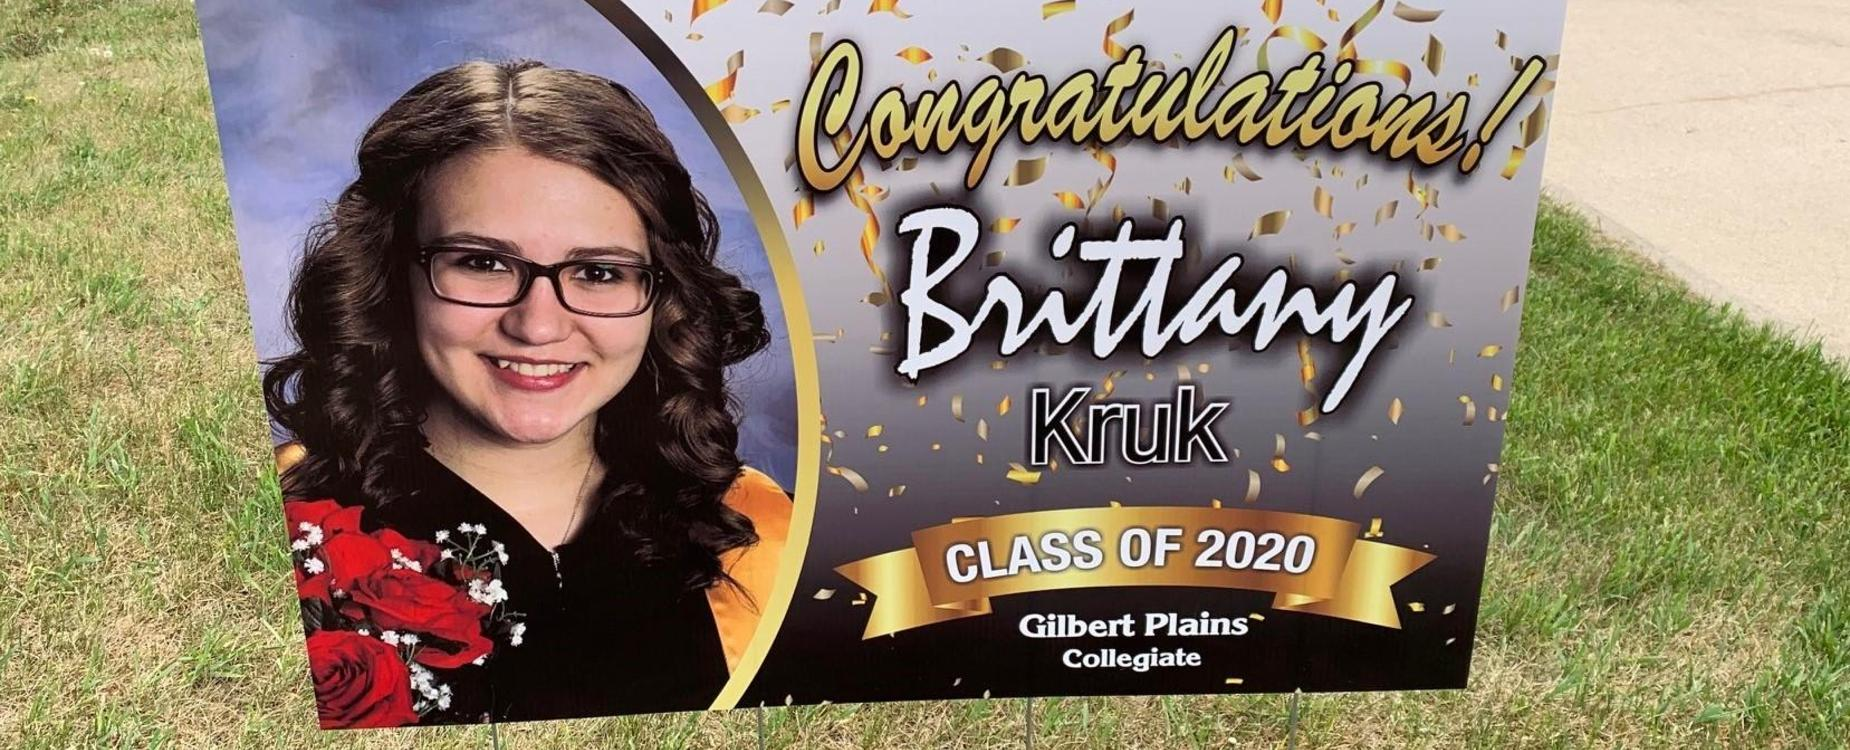 Brittany Kruk